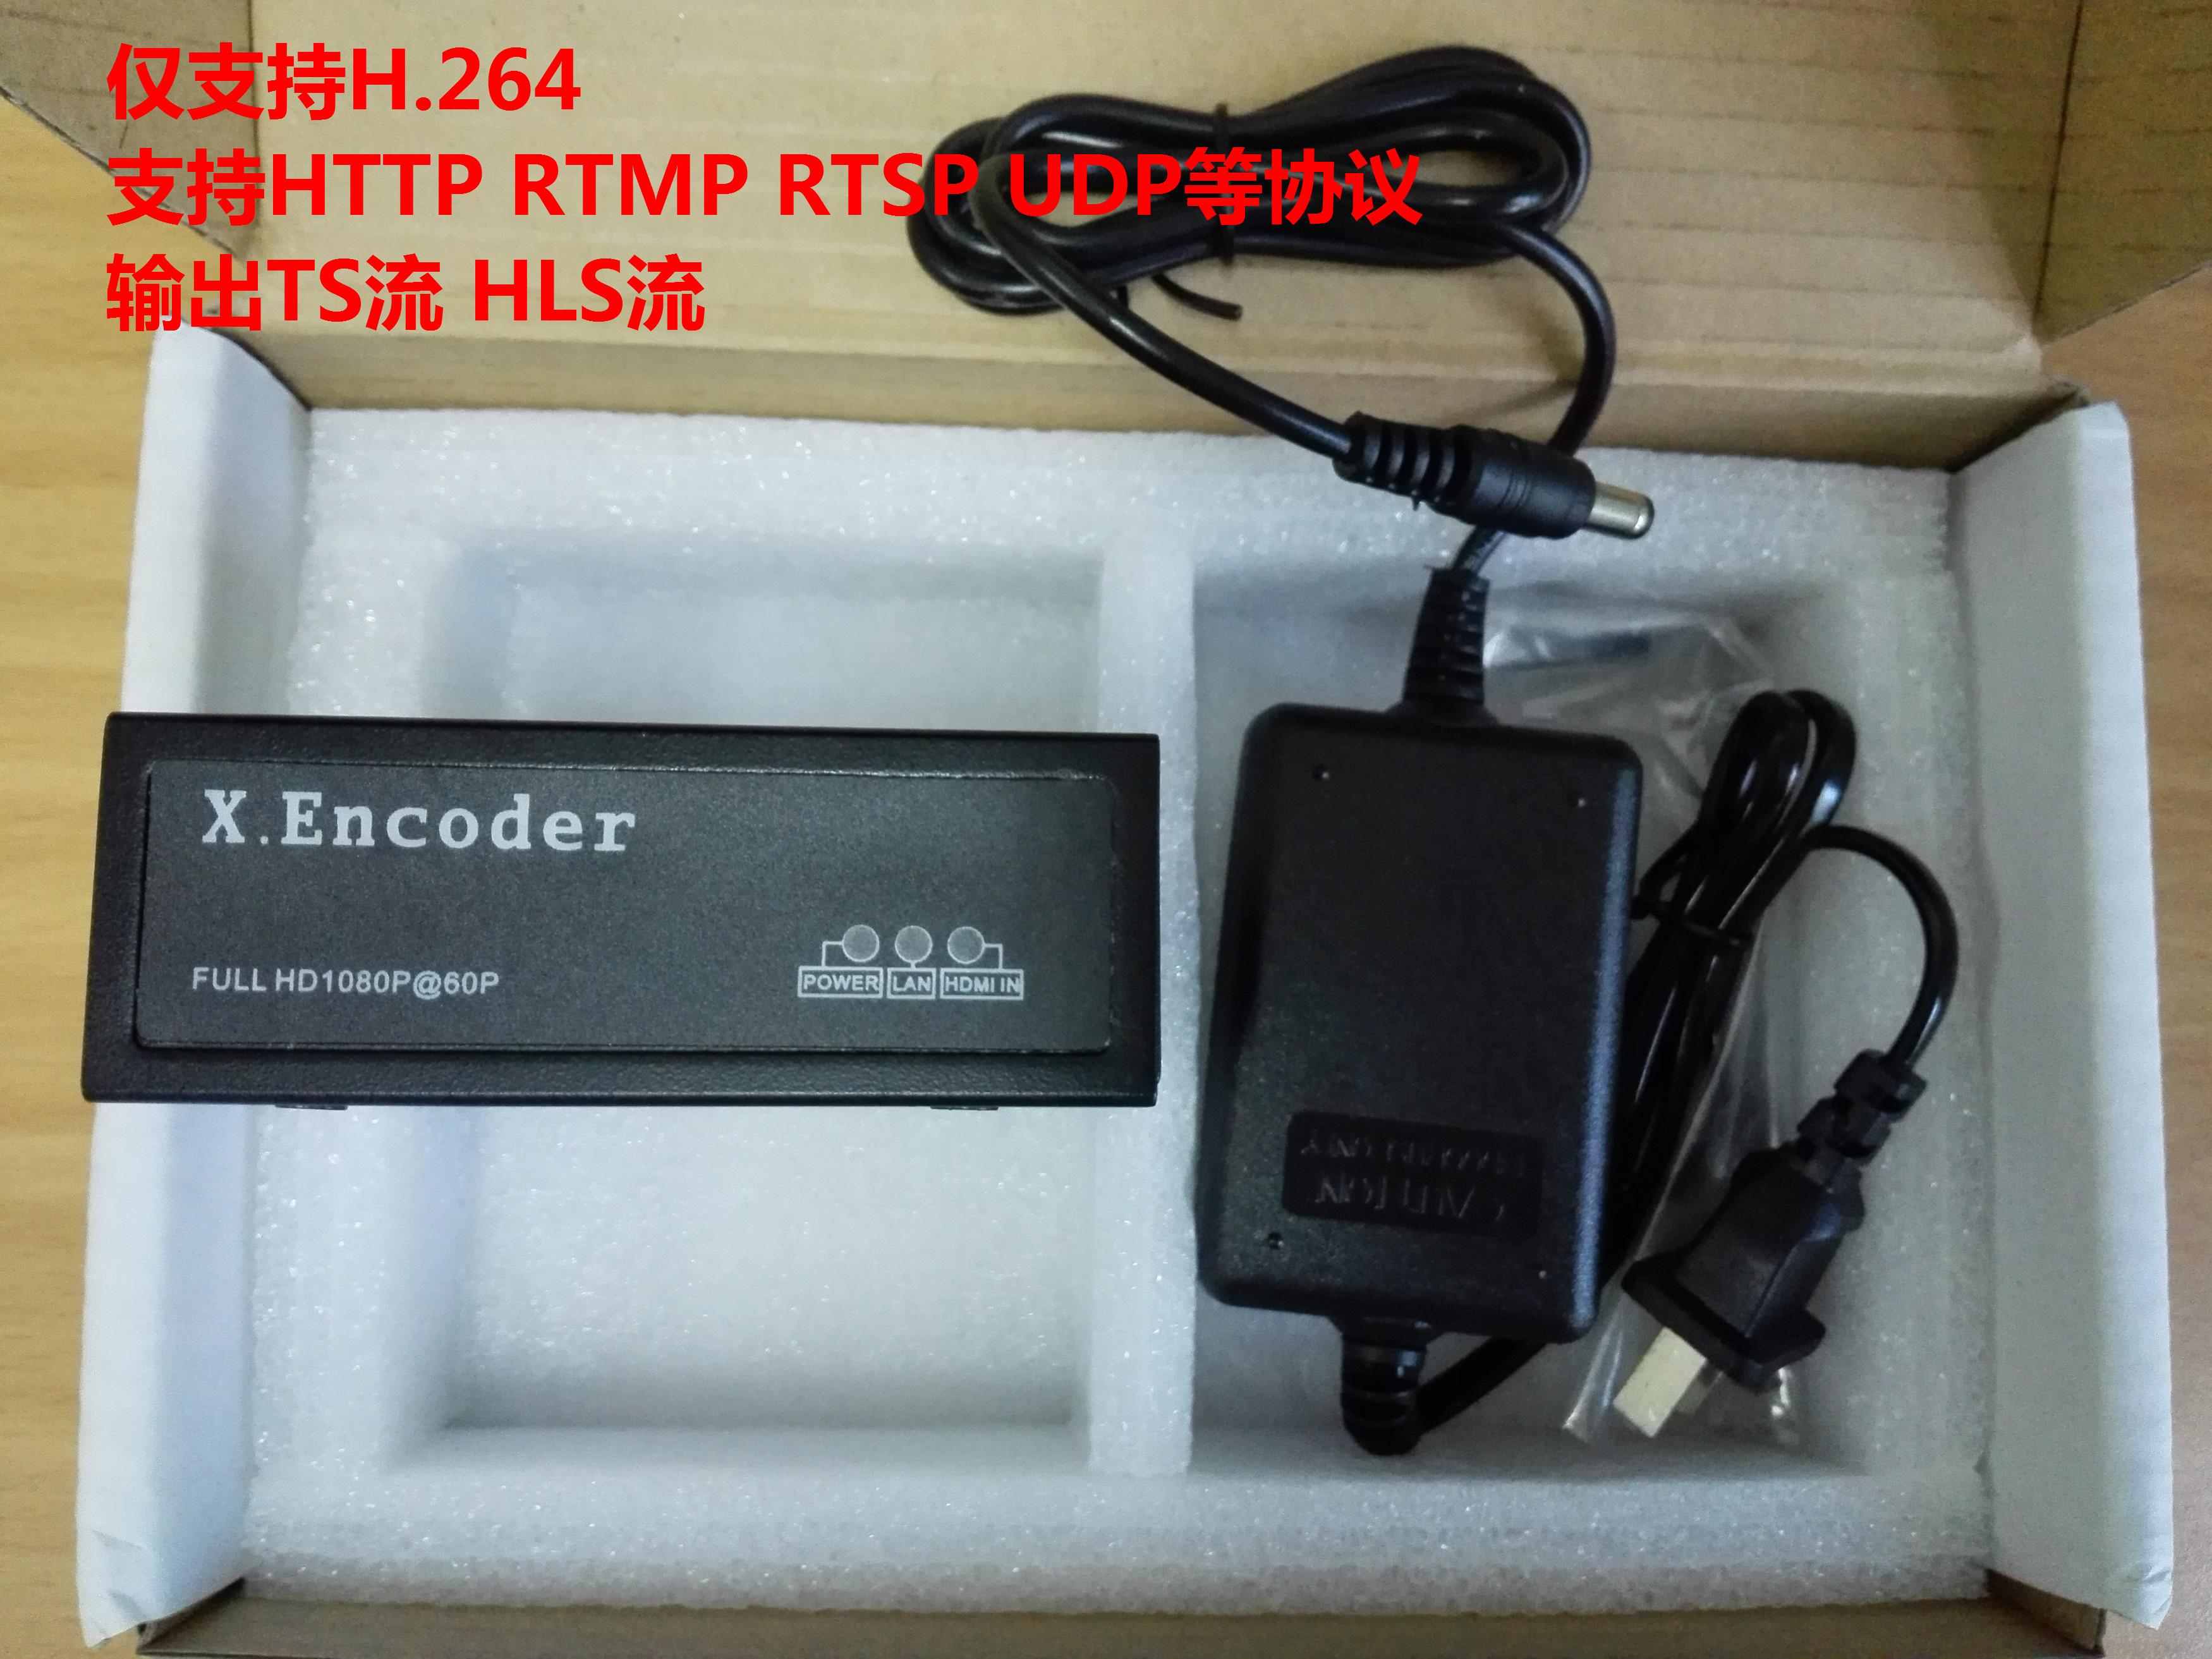 H.264 H264高清HDMI视频编码器 HDMI转IP 网络直播推流RTMP鉴权